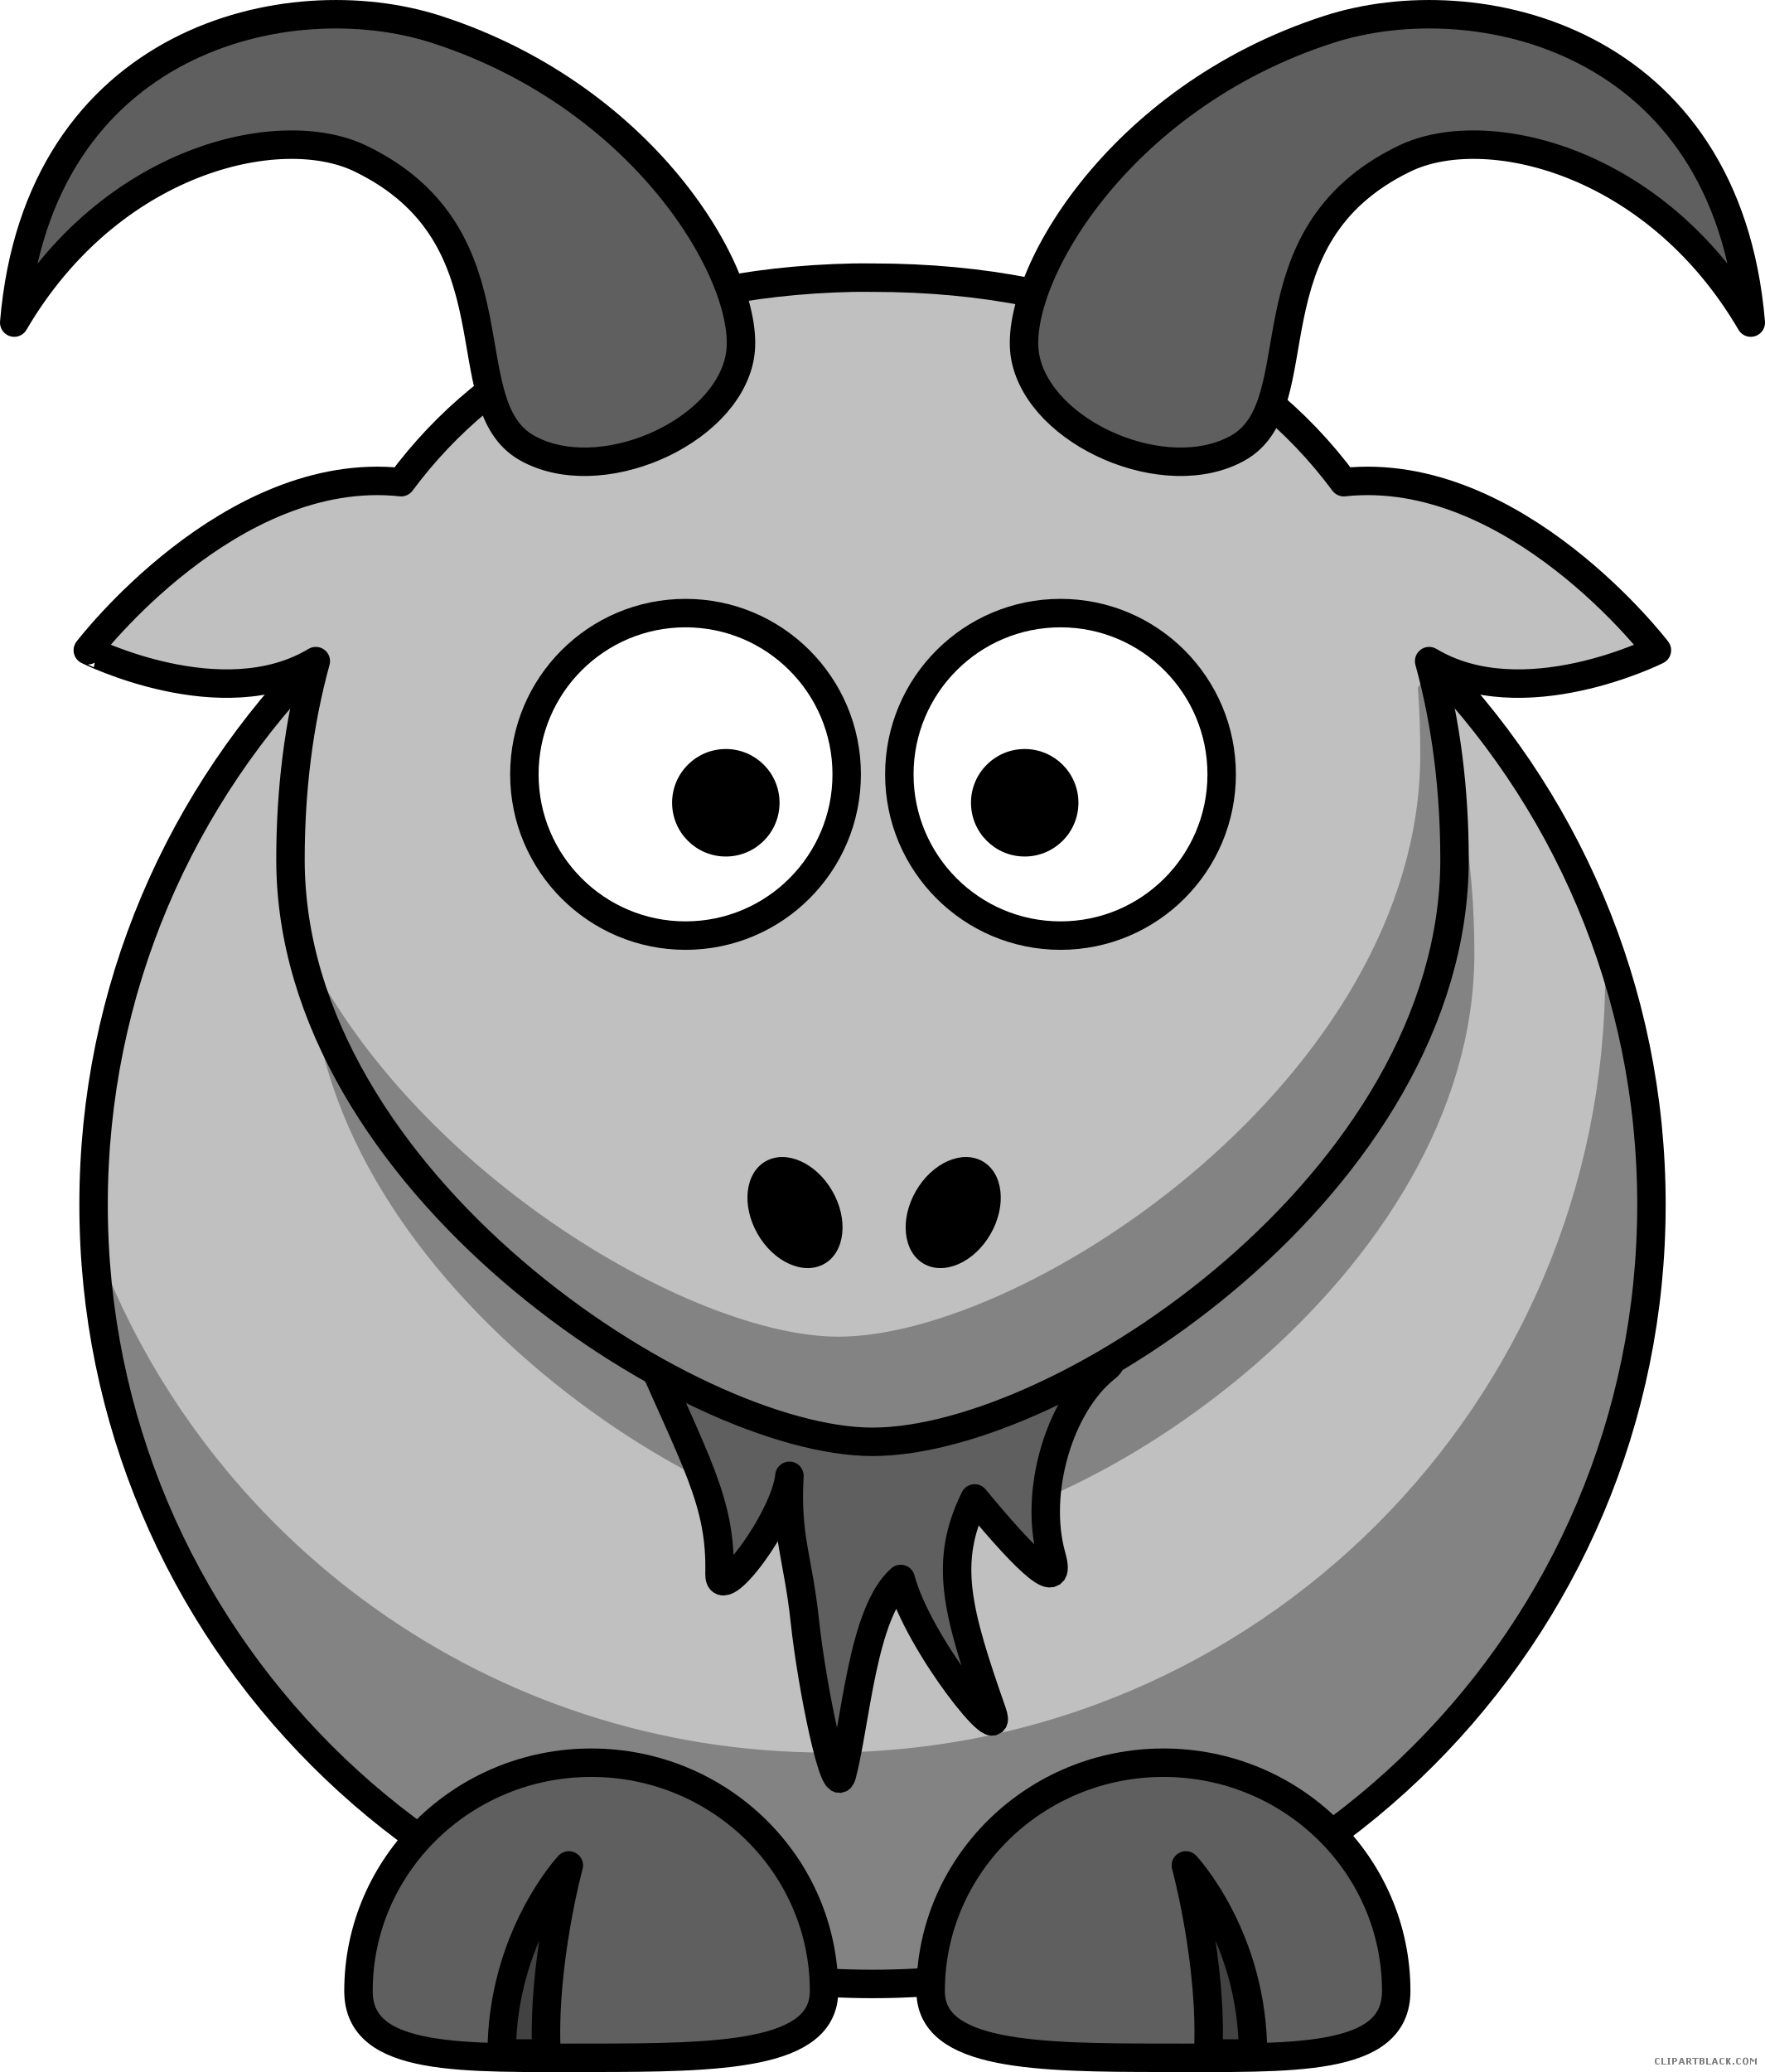 Goat gaot